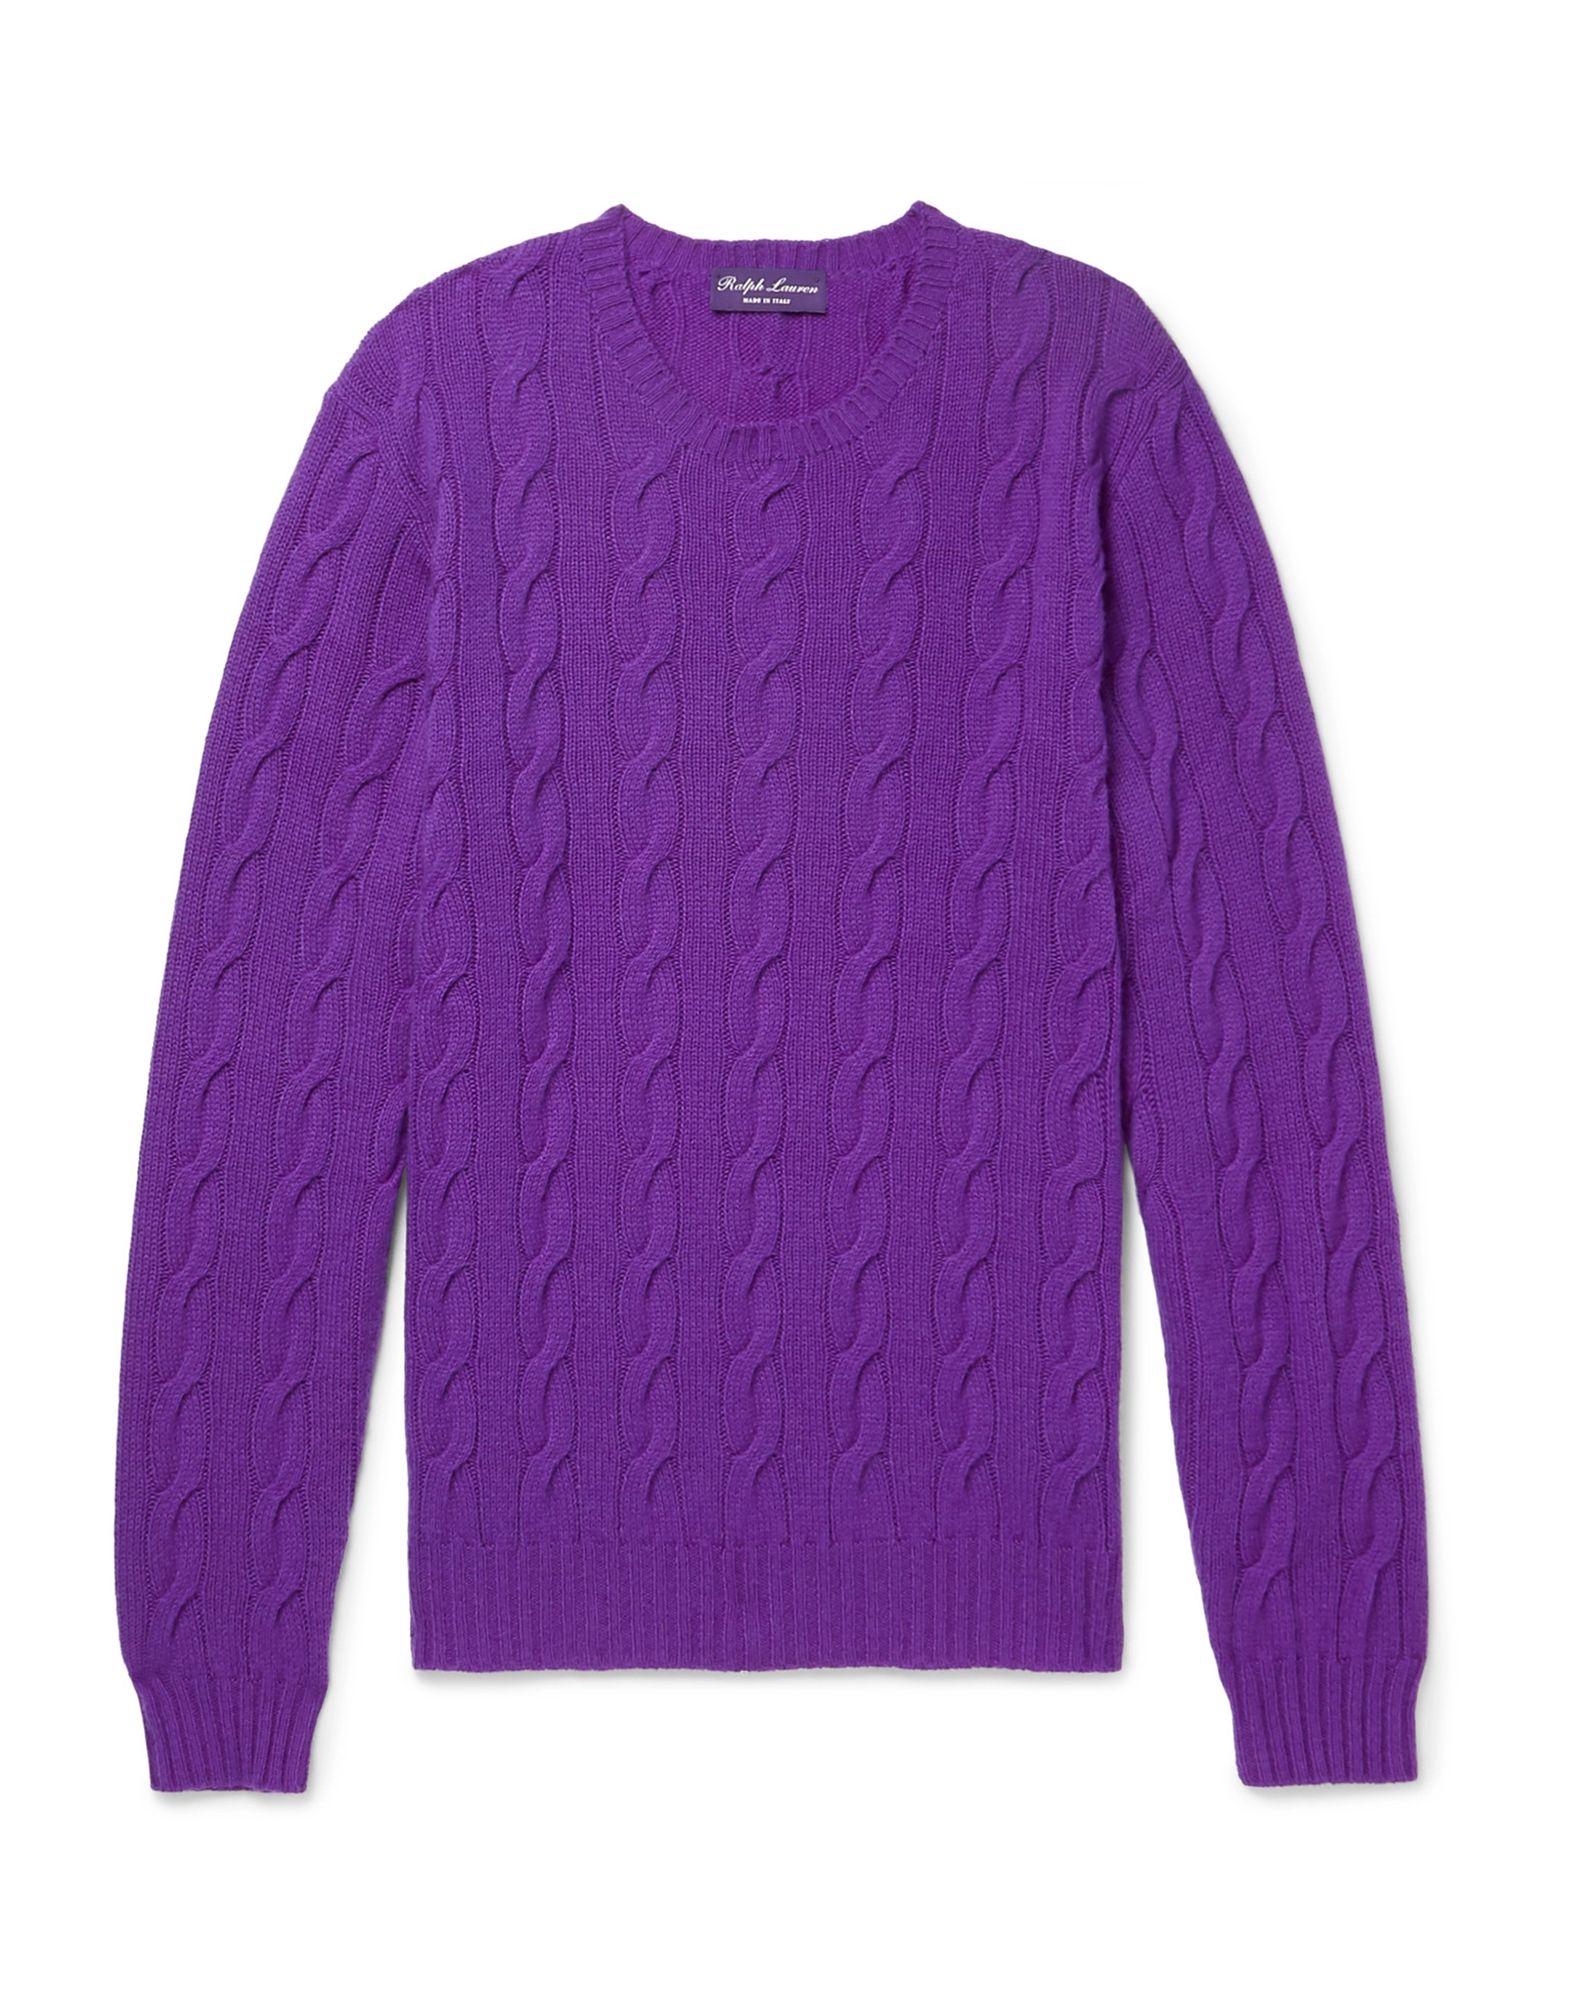 RALPH LAUREN PURPLE LABEL Свитер ralph lauren purple label пальто